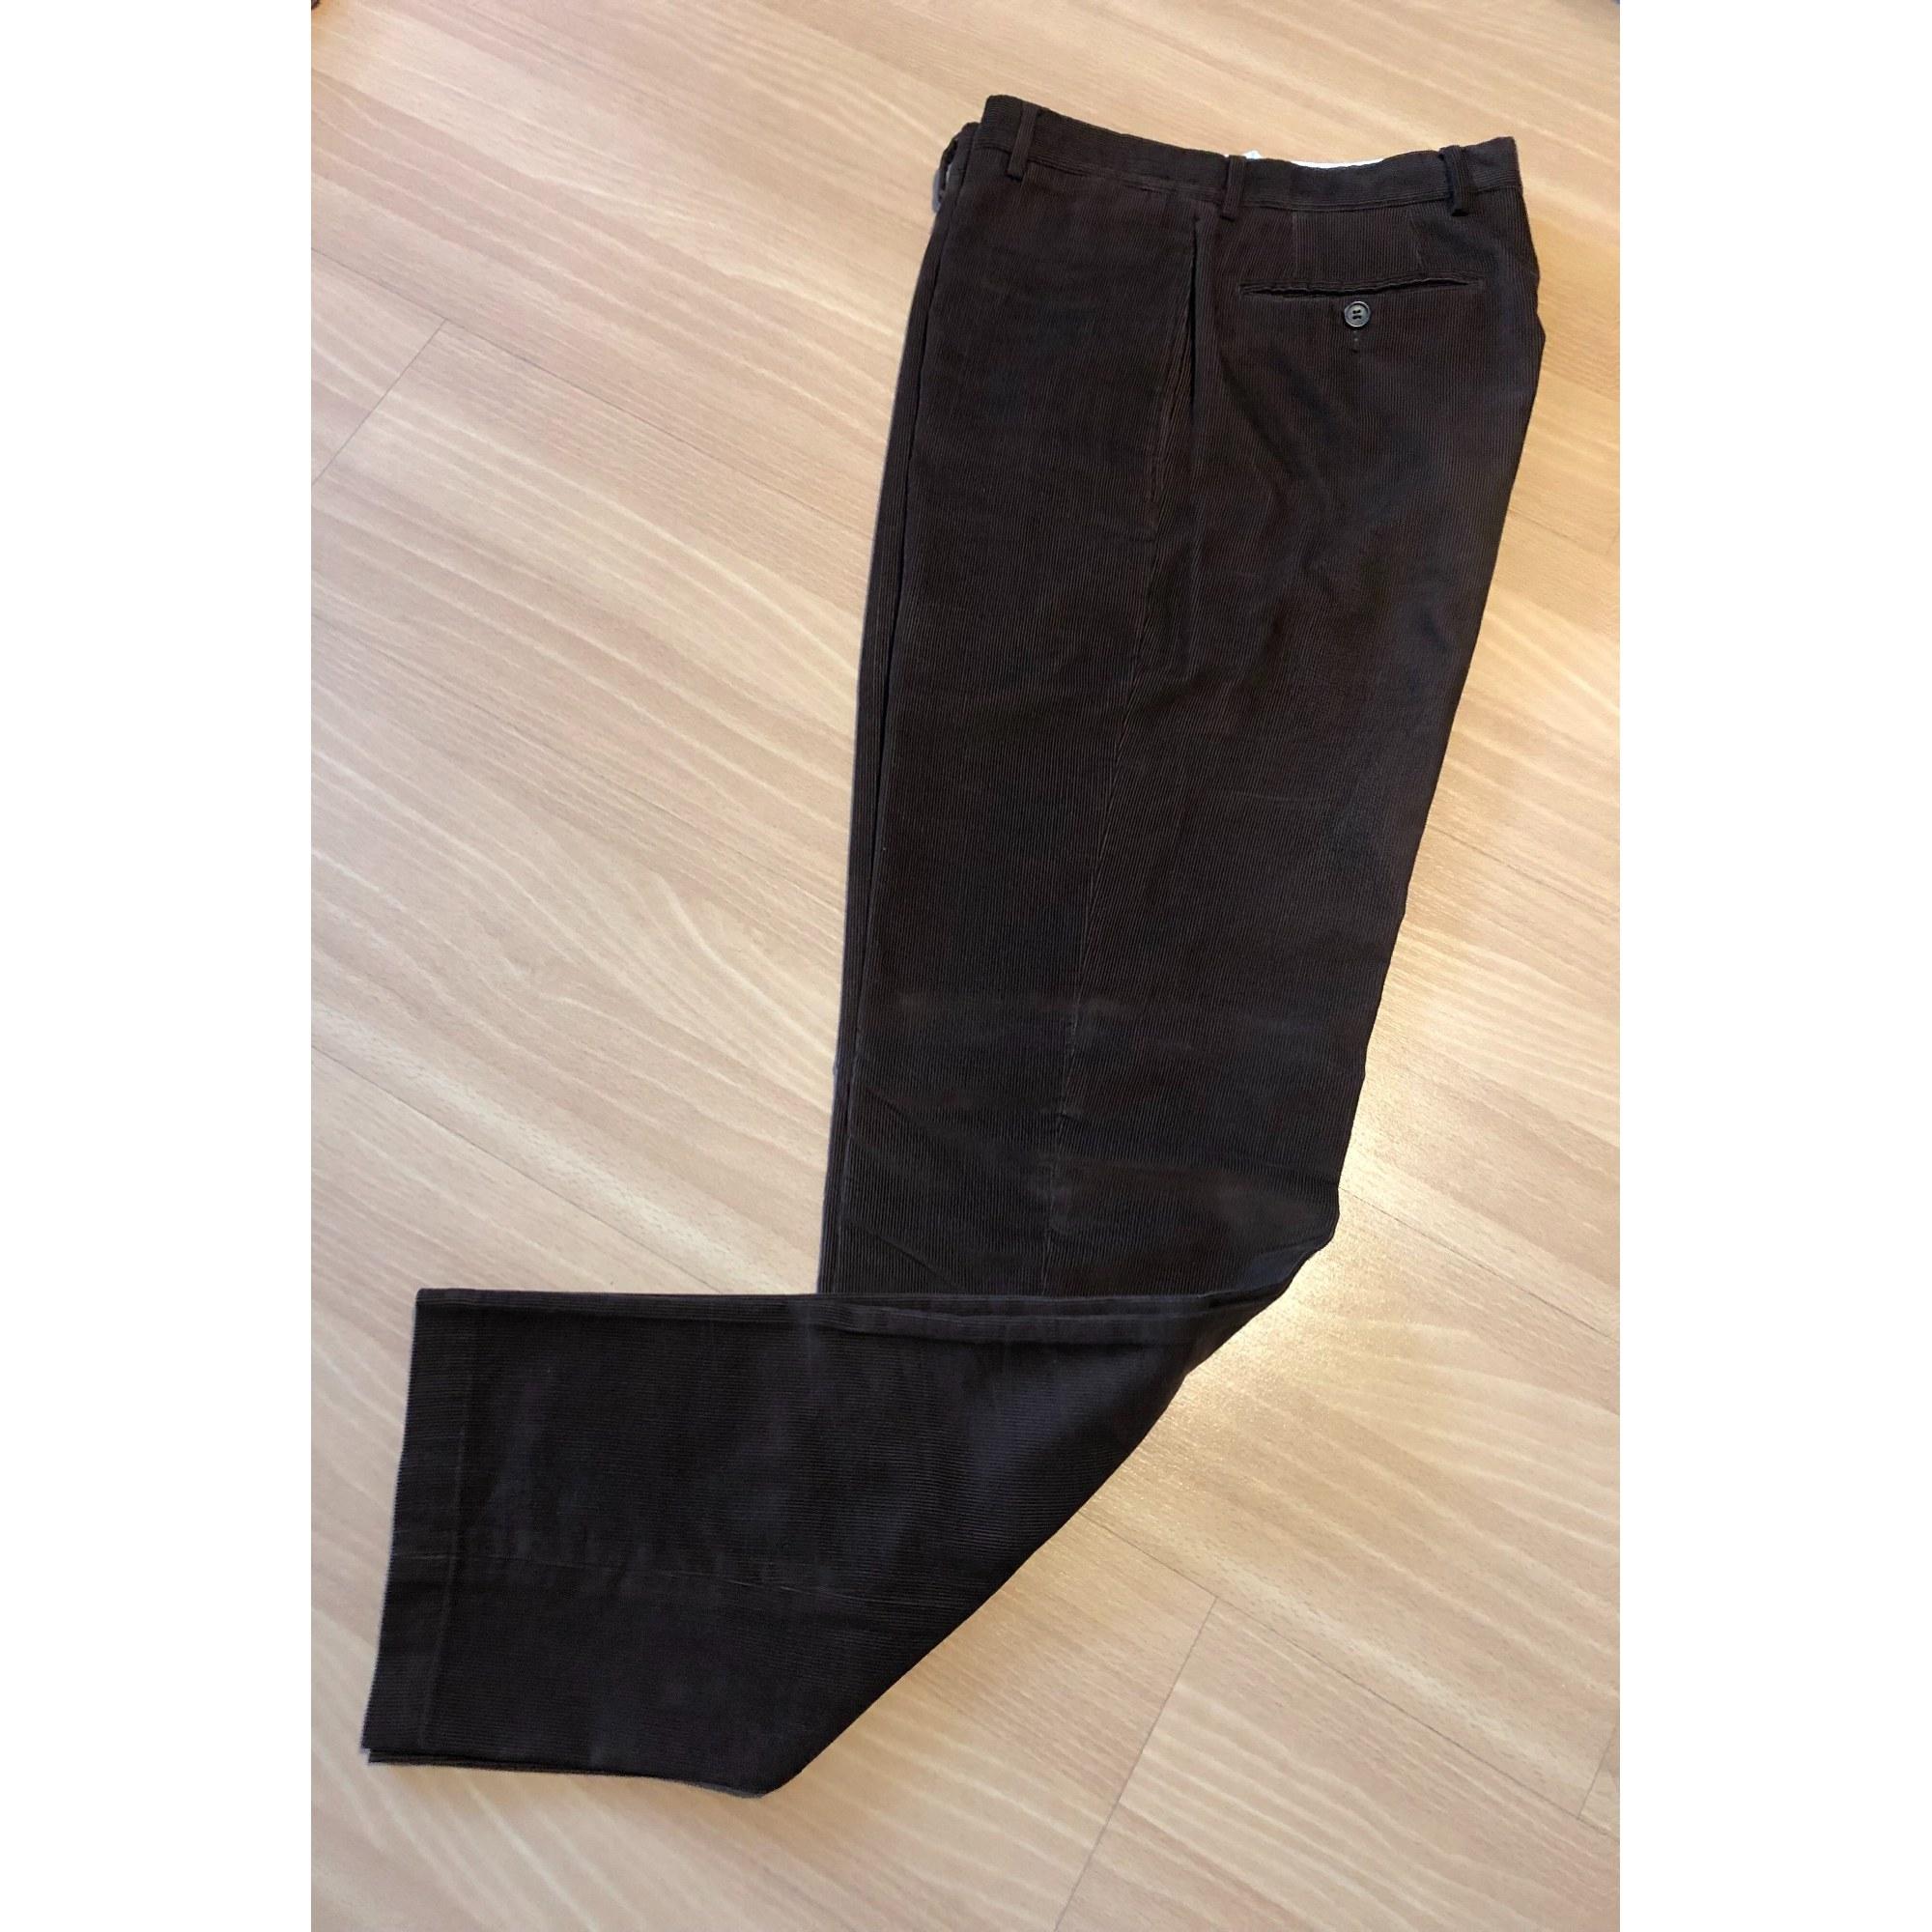 Pantalon droit FAÇONNABLE Marron